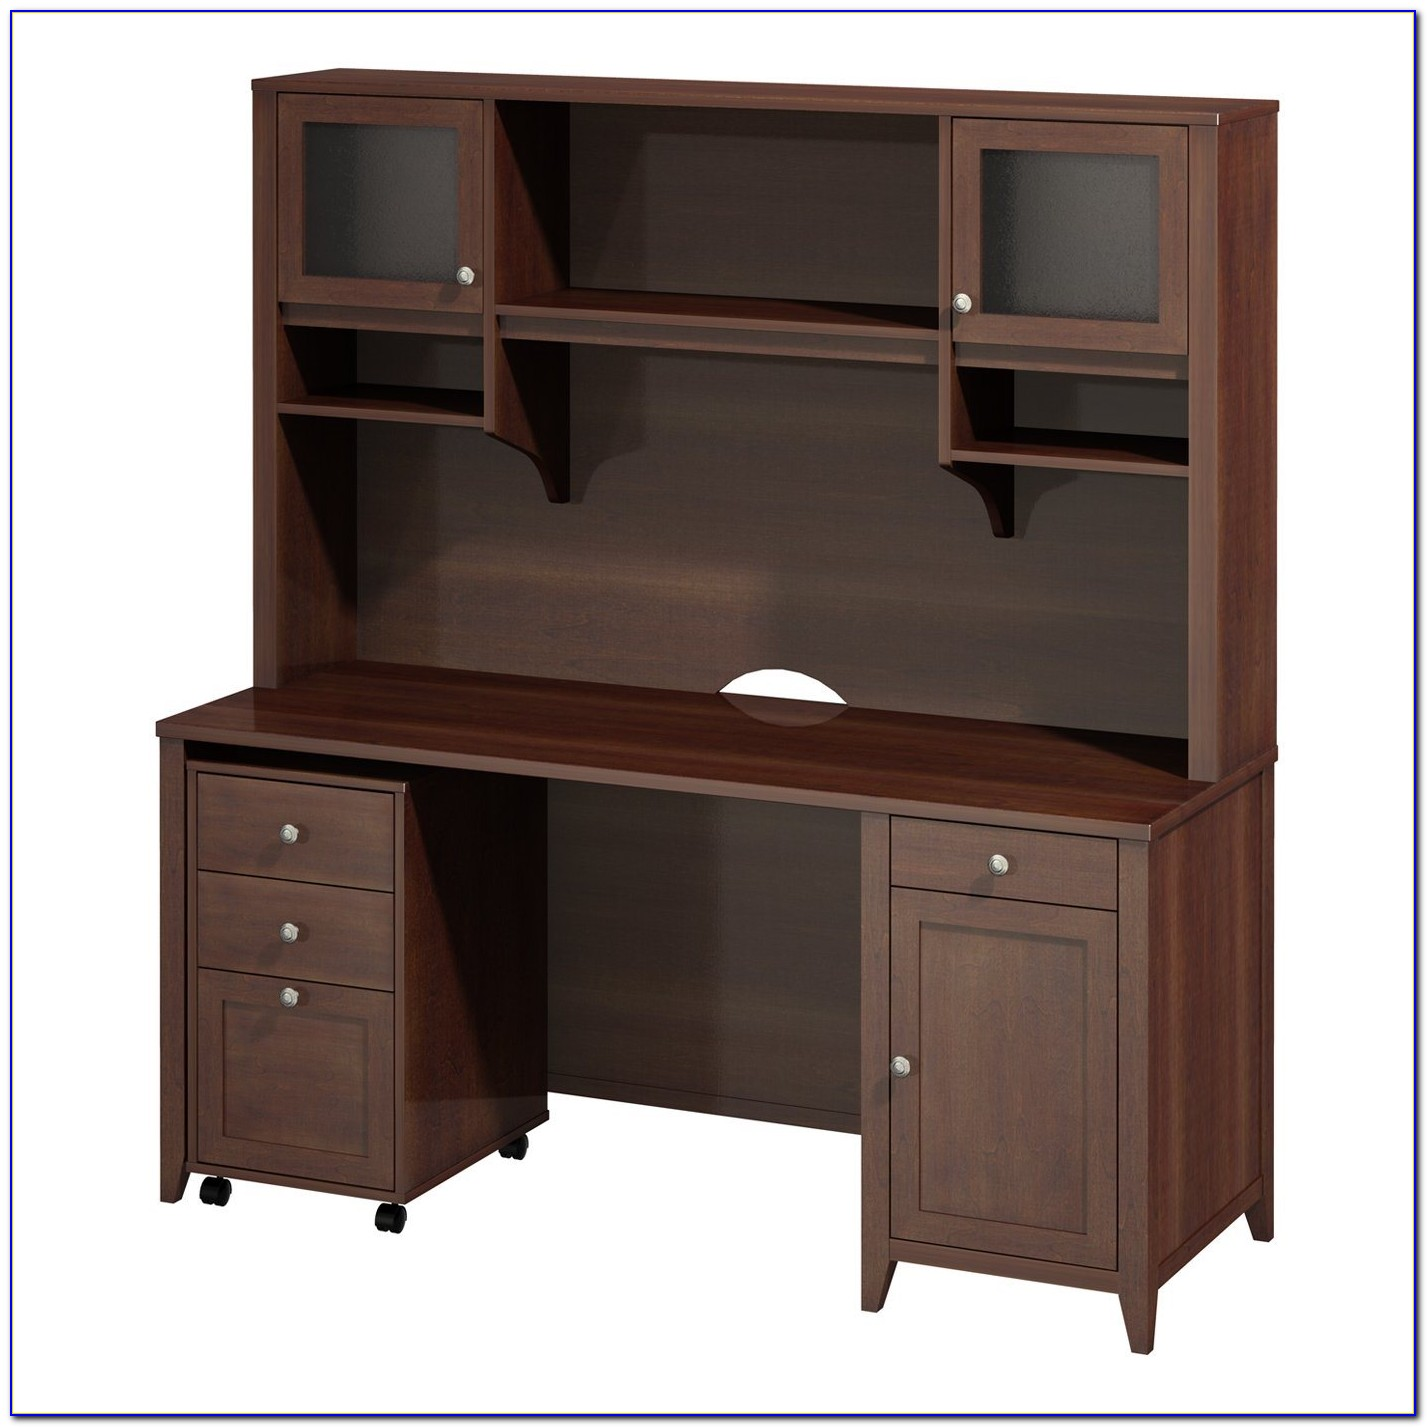 Kathy Ireland White Office Furniture